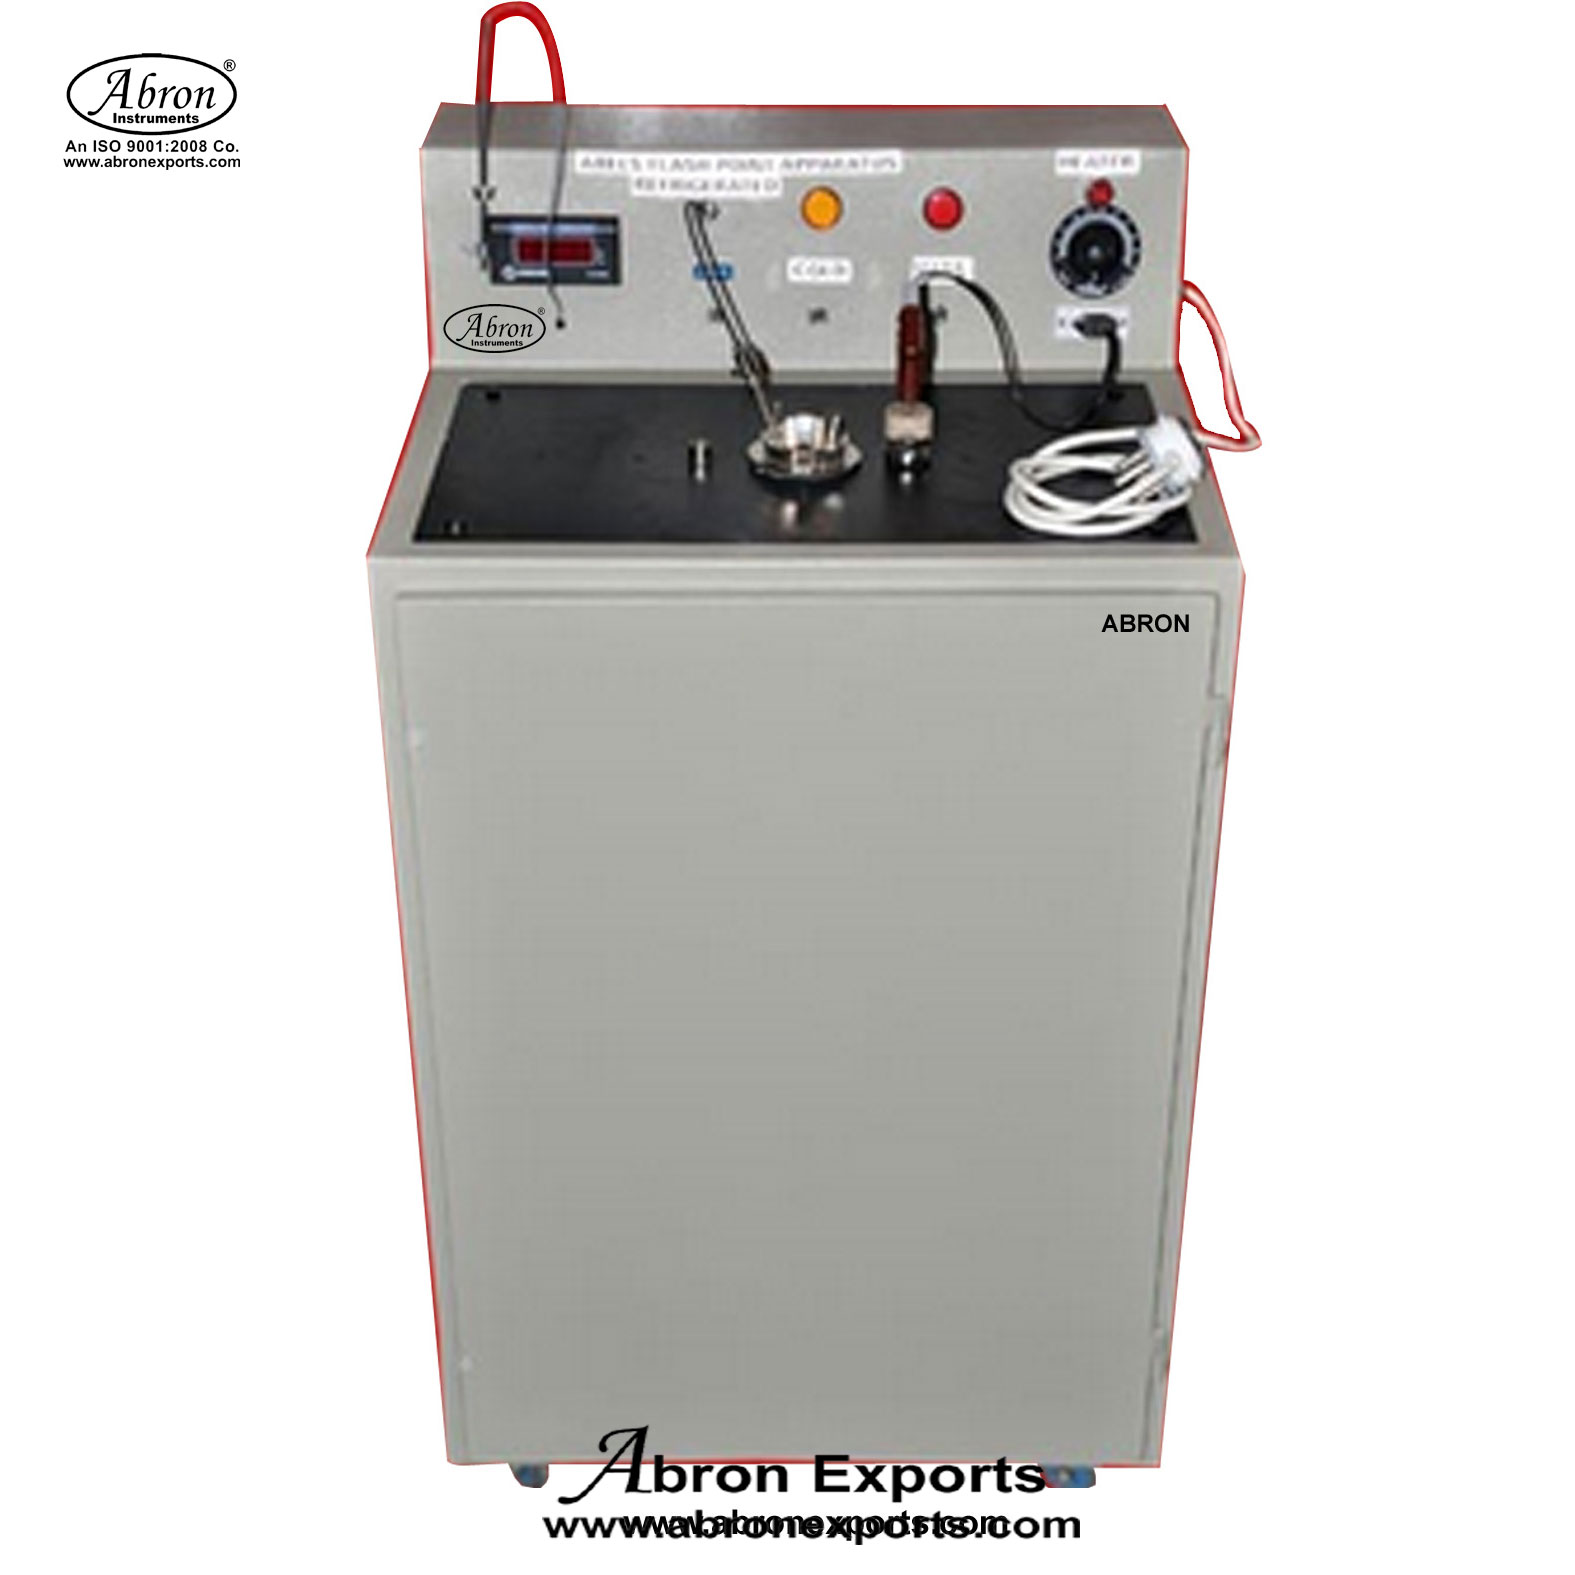 Abels Flash Point Apparatus Digital Abron AO-309D